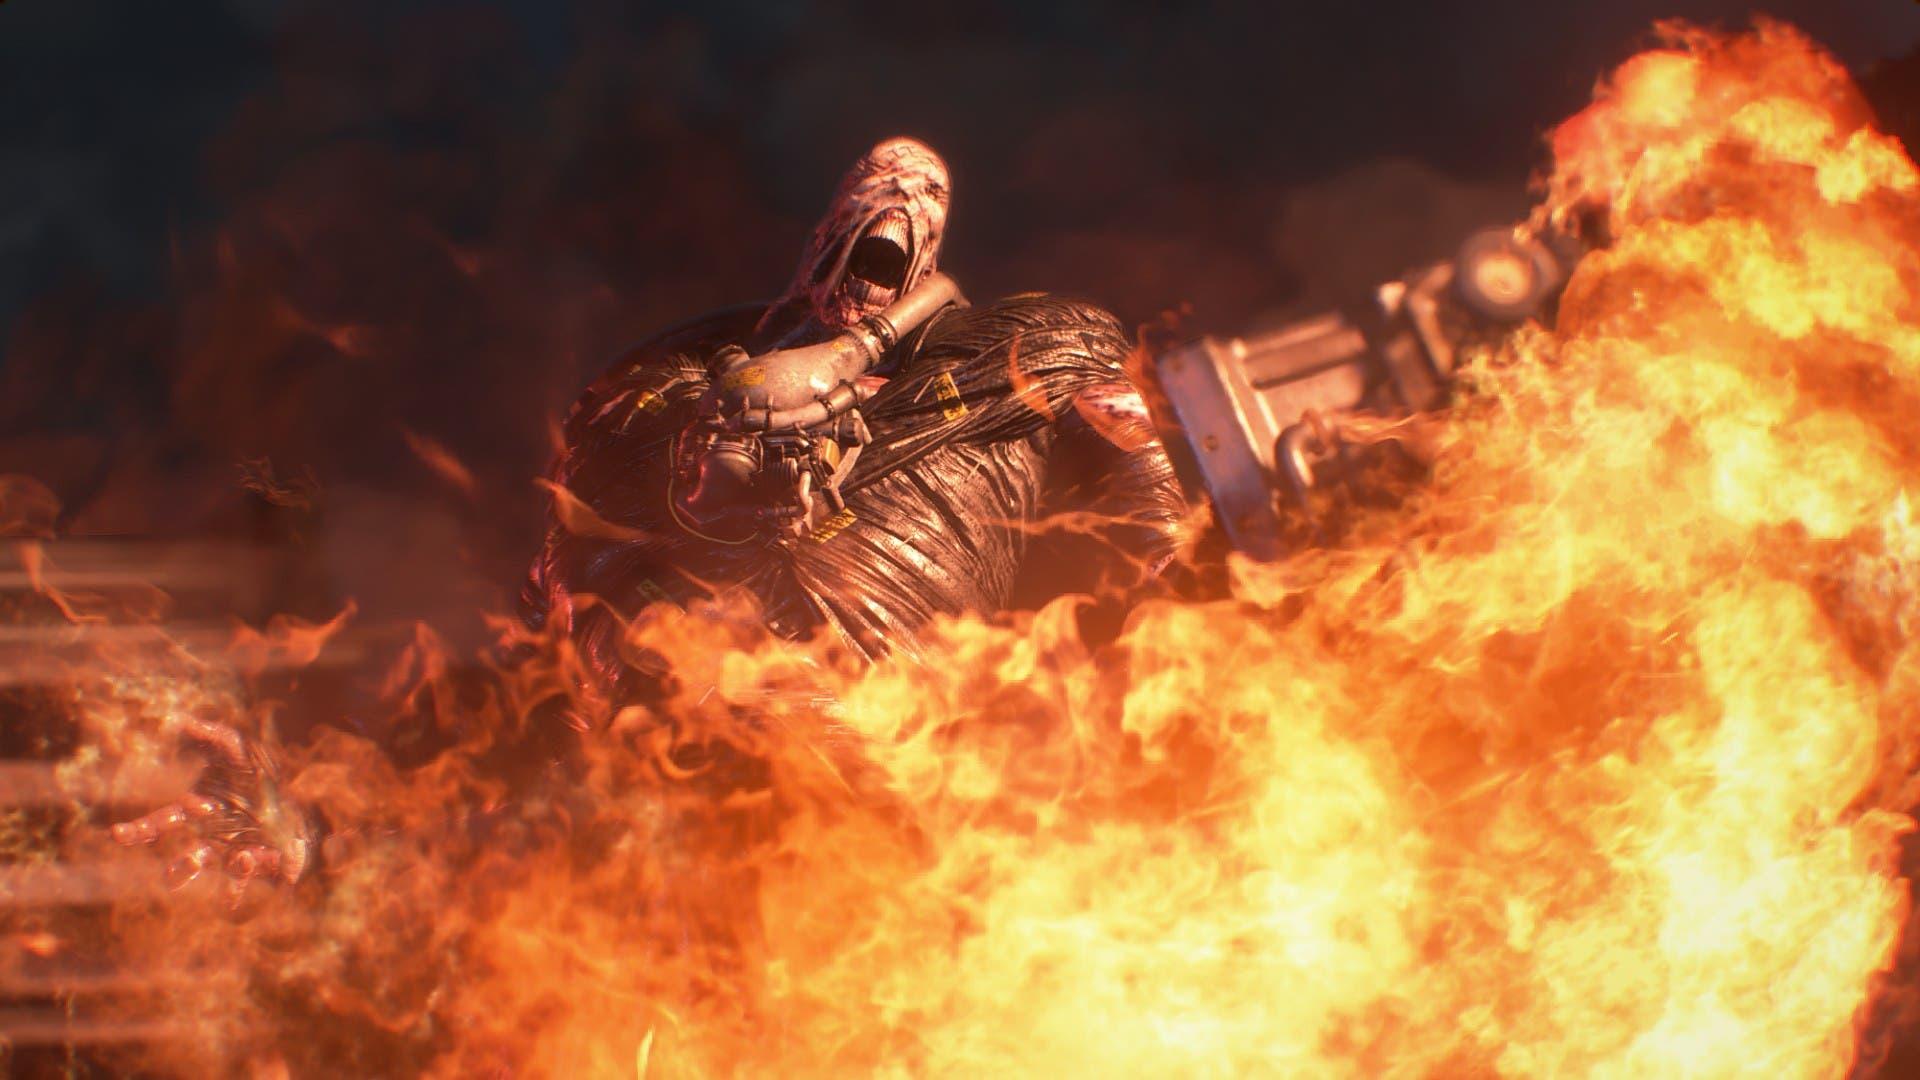 Cuatro juegos de Resident Evil para jugar antes de Resident Evil 3 3